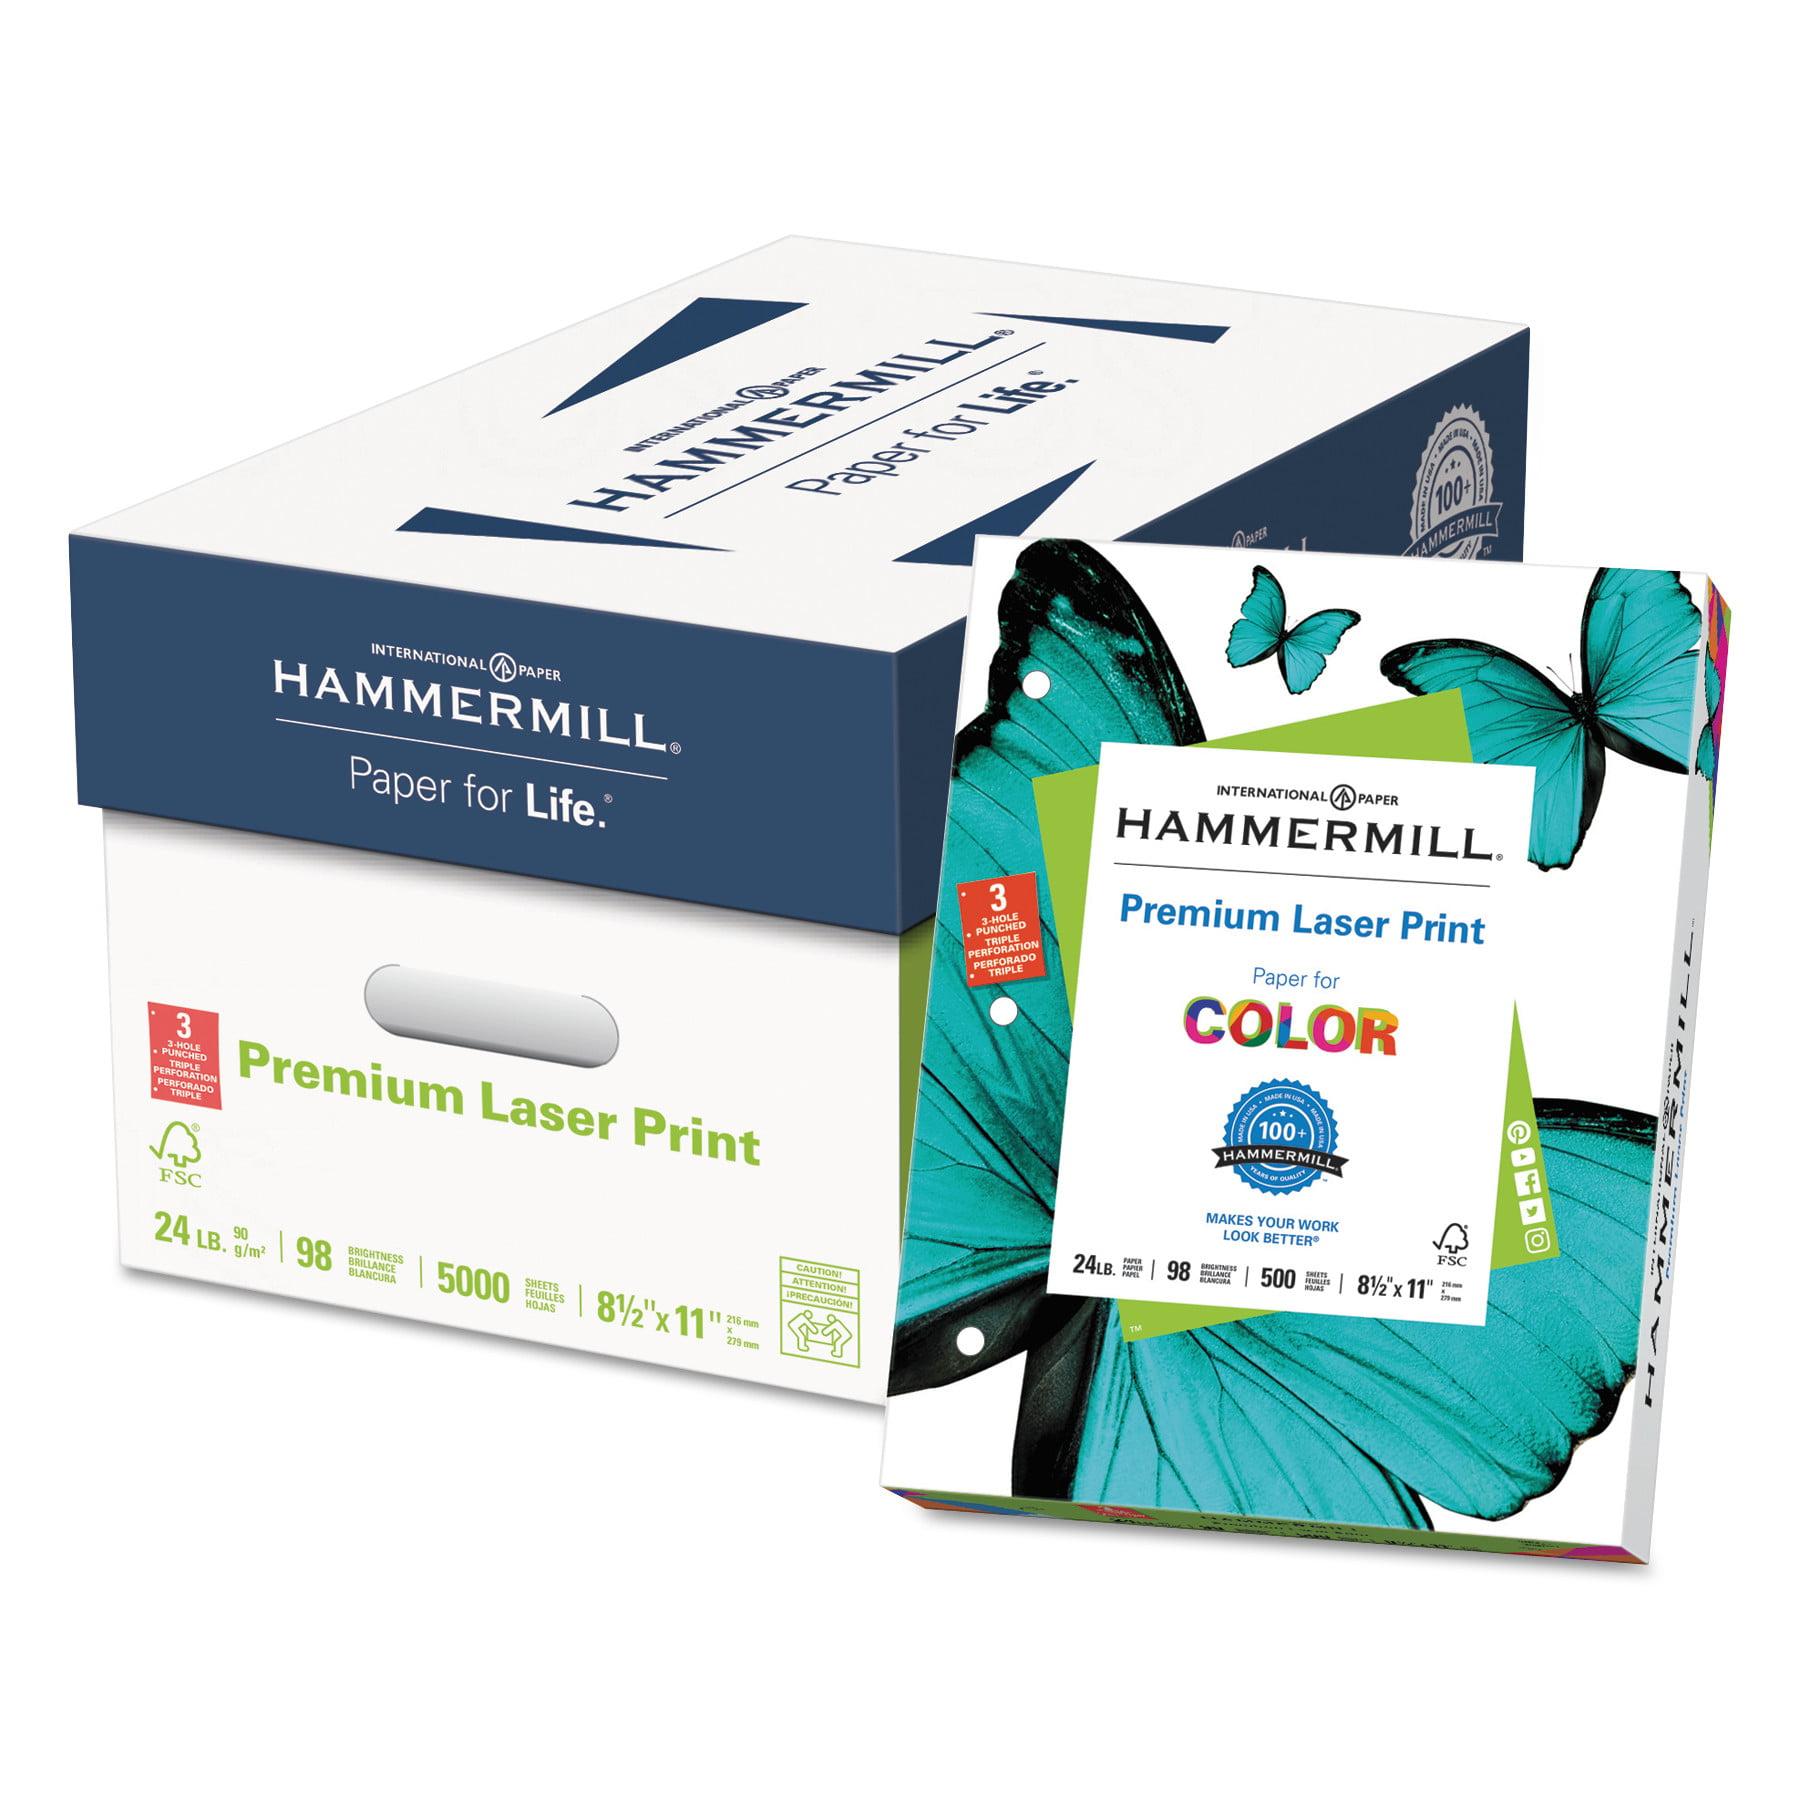 Hammermill Premium Laser Paper, 3-Hole Punch, 98 Bright, 24lb, Ltr, White, 500 Sheets/Ream -HAM107681